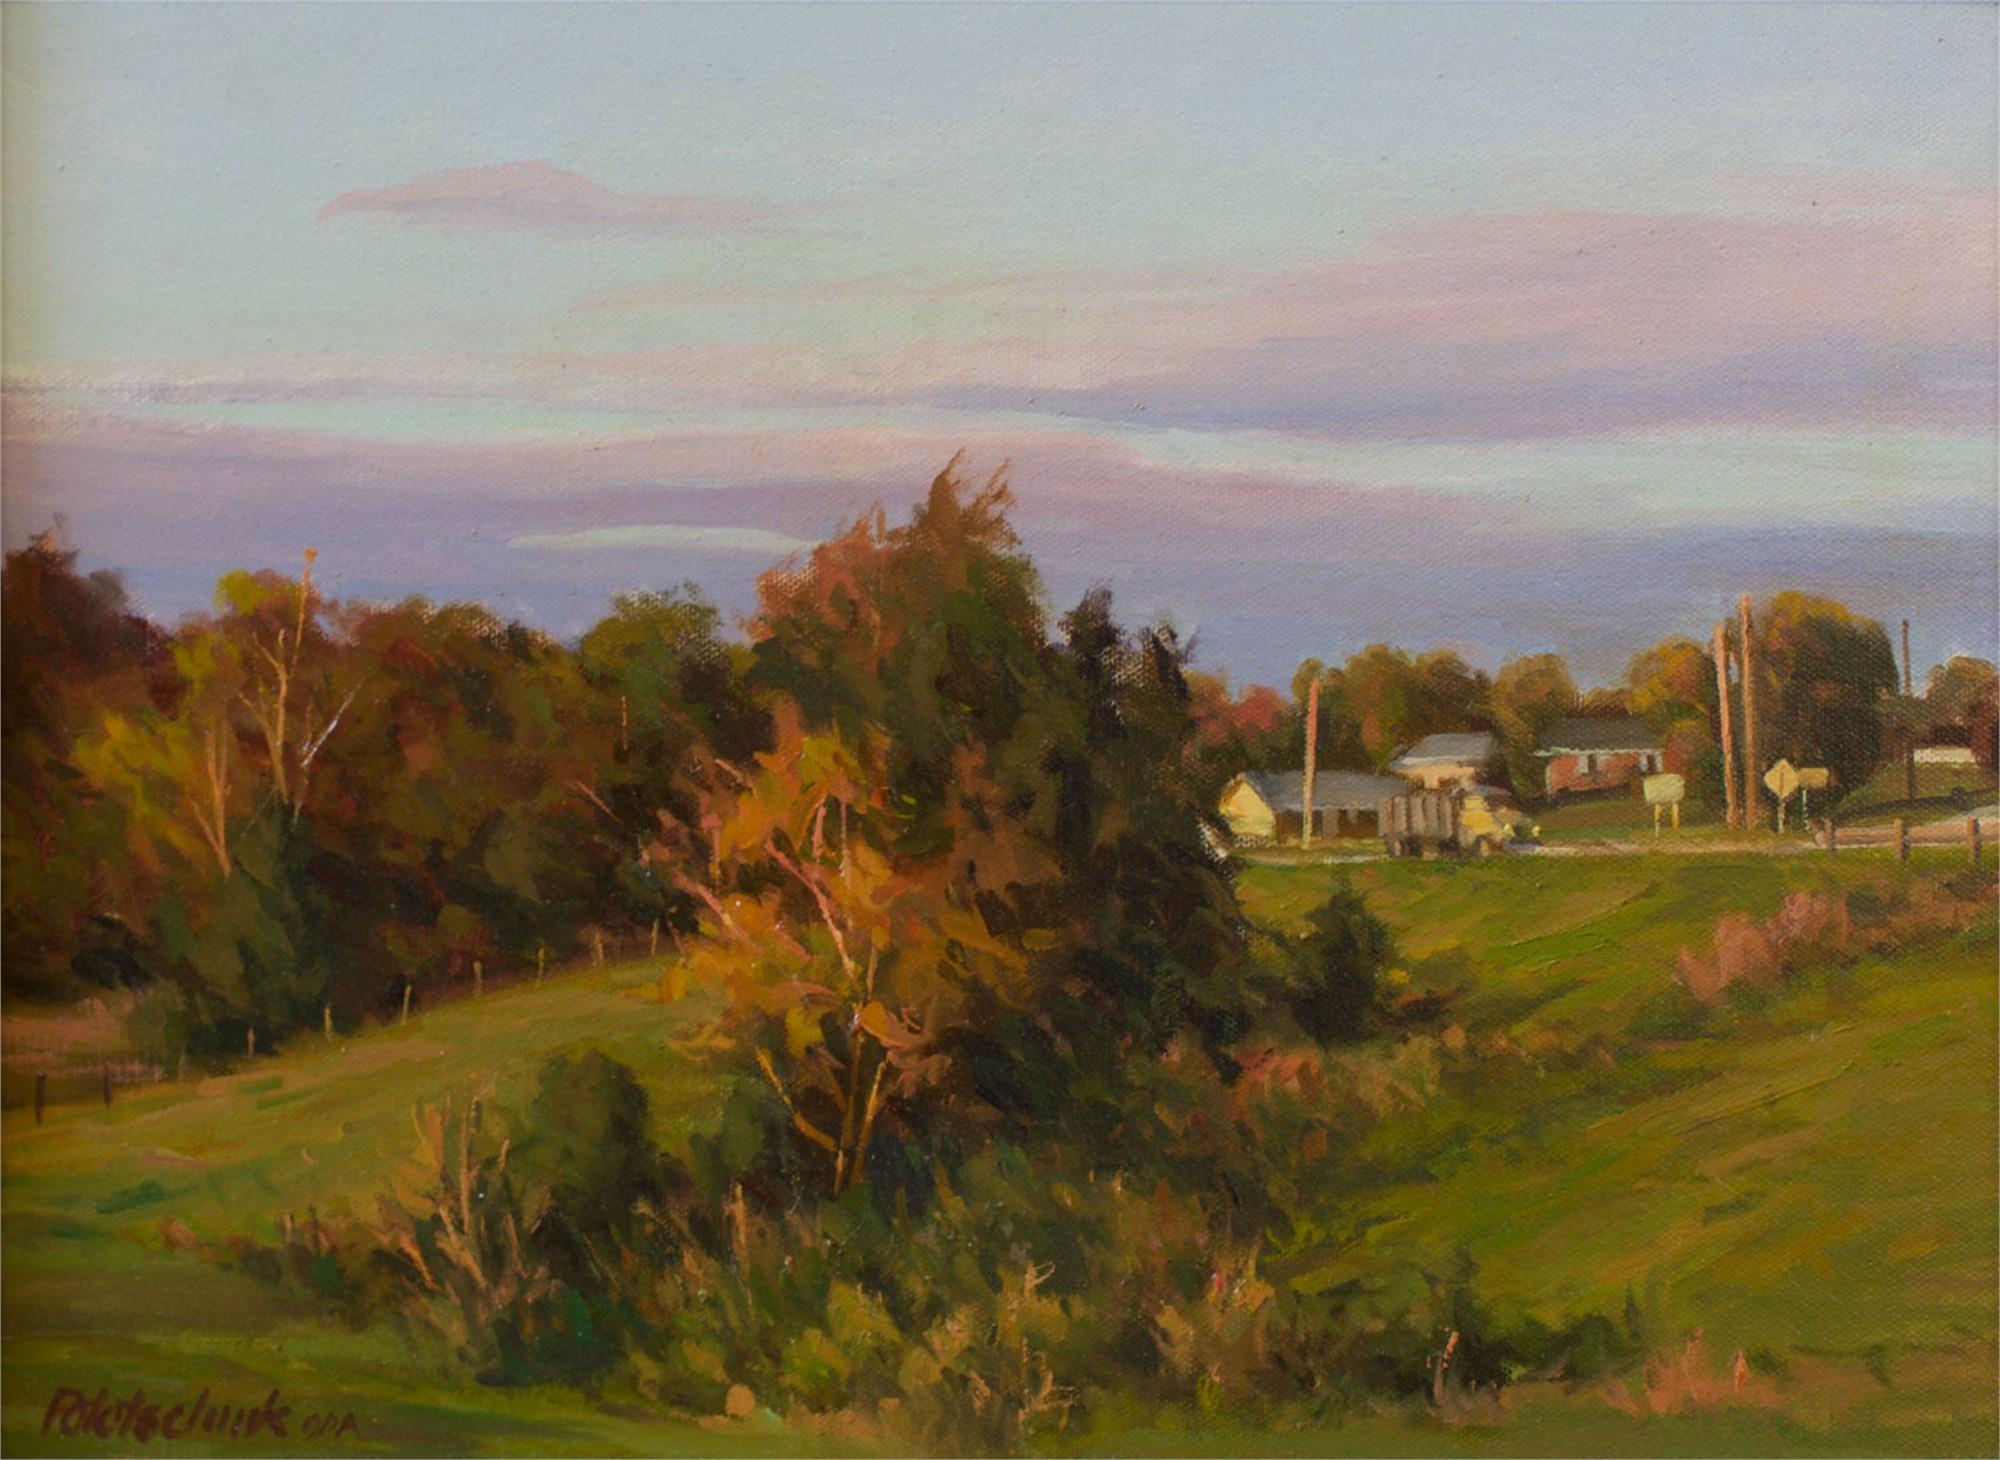 Along the Highway by John Pototschnik